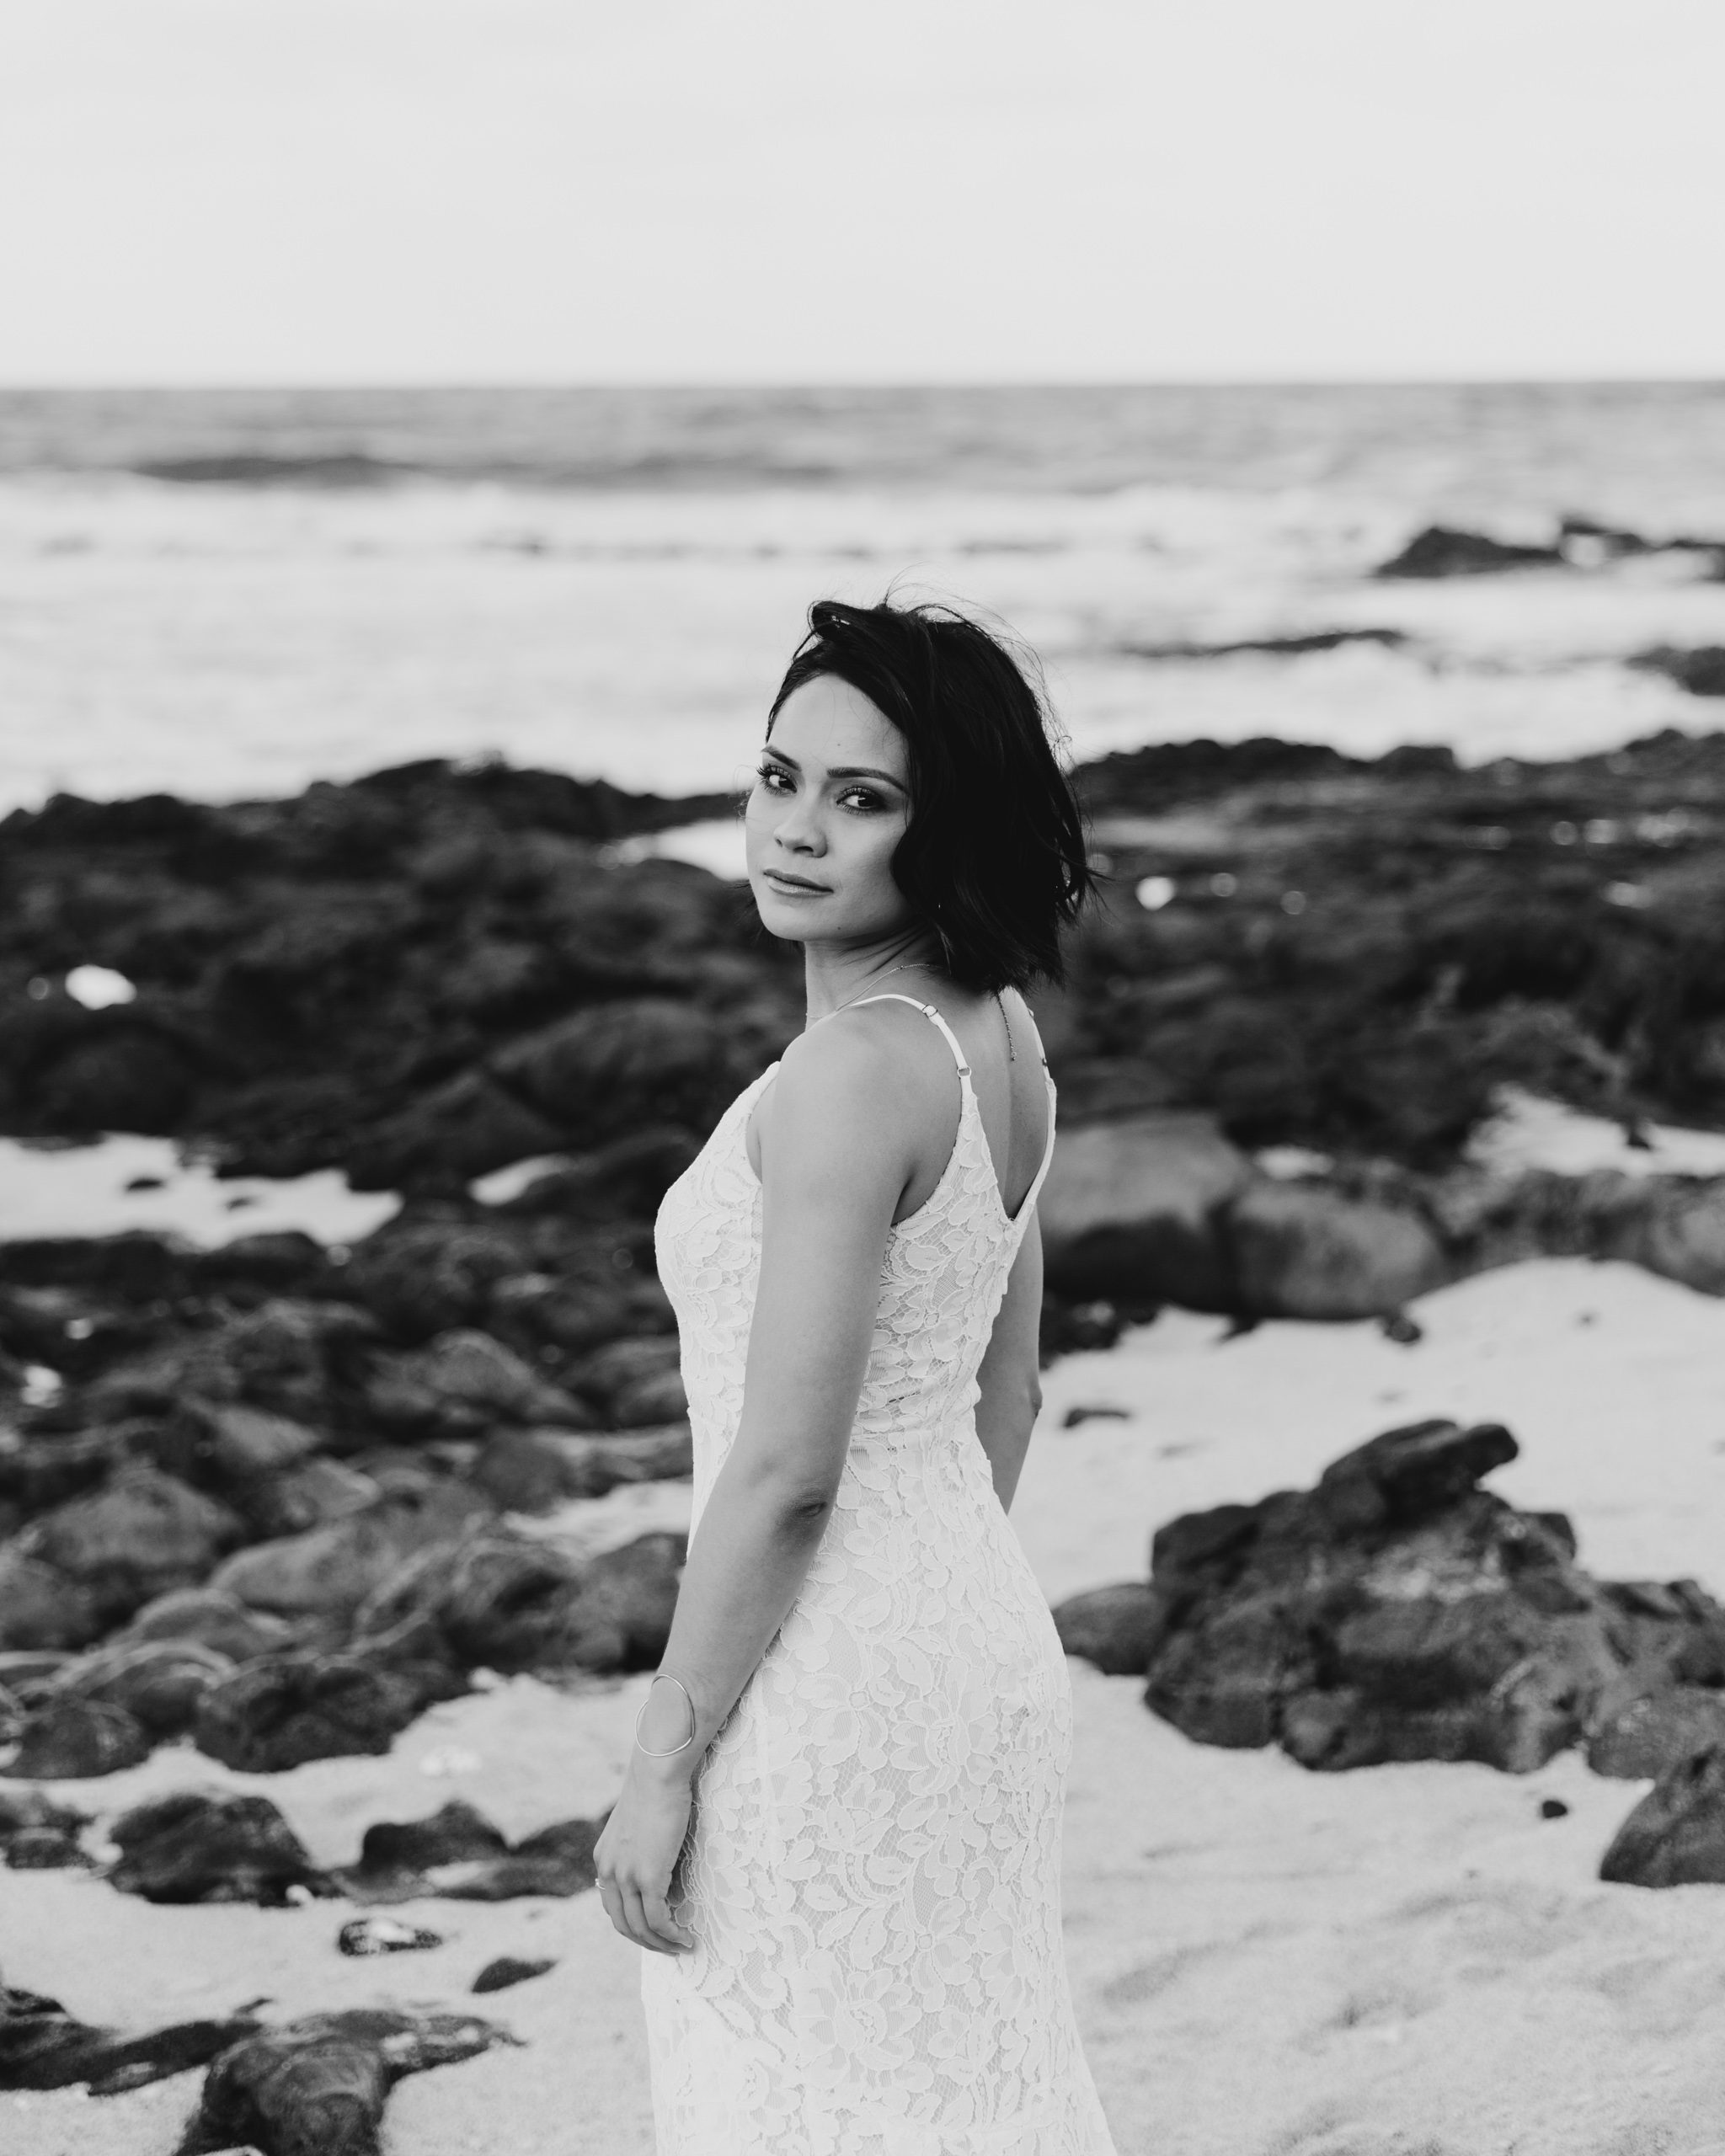 black and white makapuu bridal portraits by hawaii wedding photographer Desiree Leilani